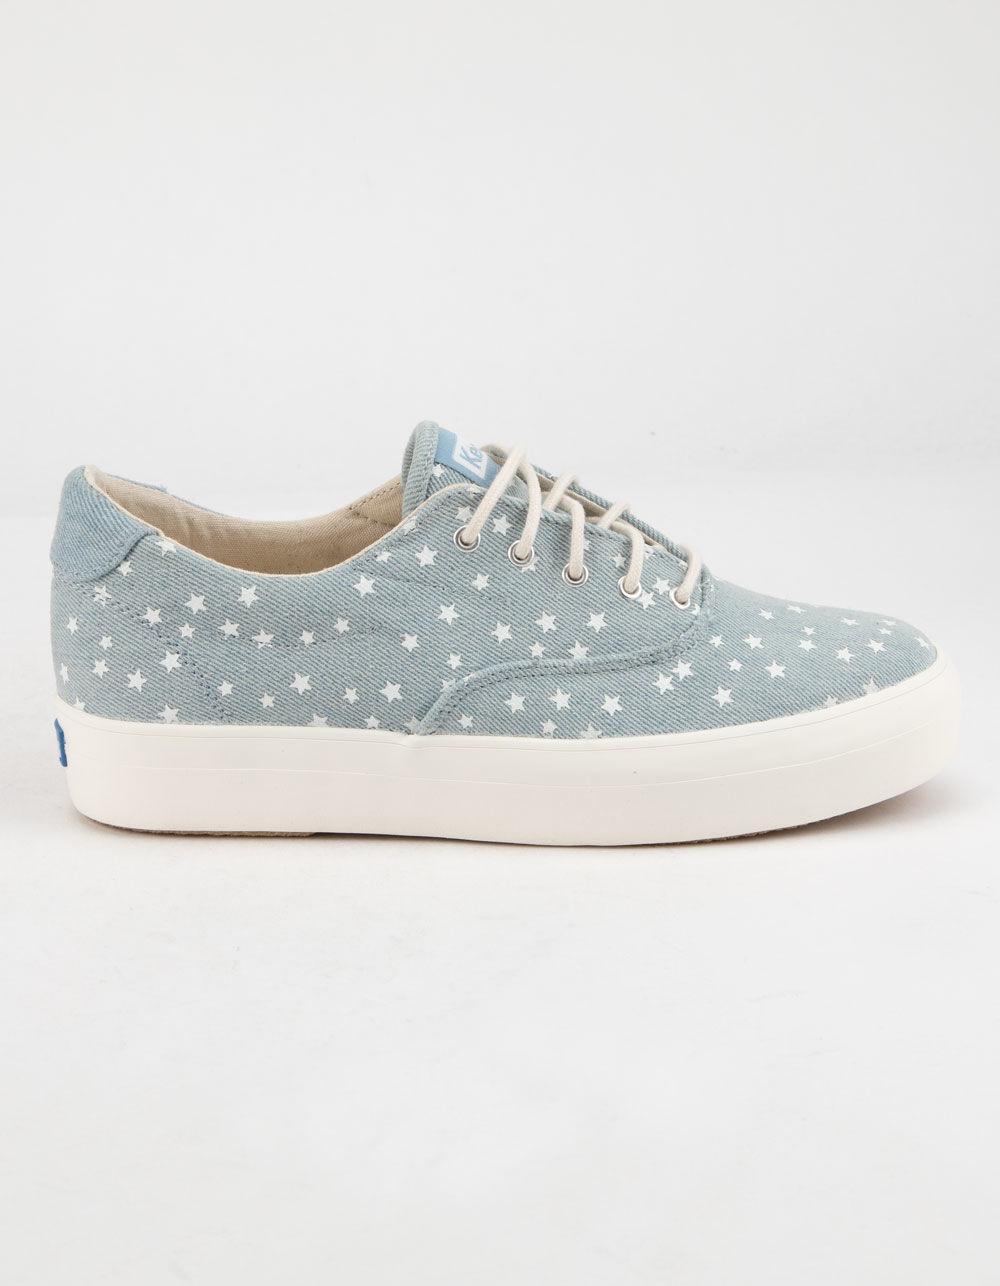 4ba3208a74468 Lyst - Keds Rise Denim Star Light Blue Womens Shoes in Blue